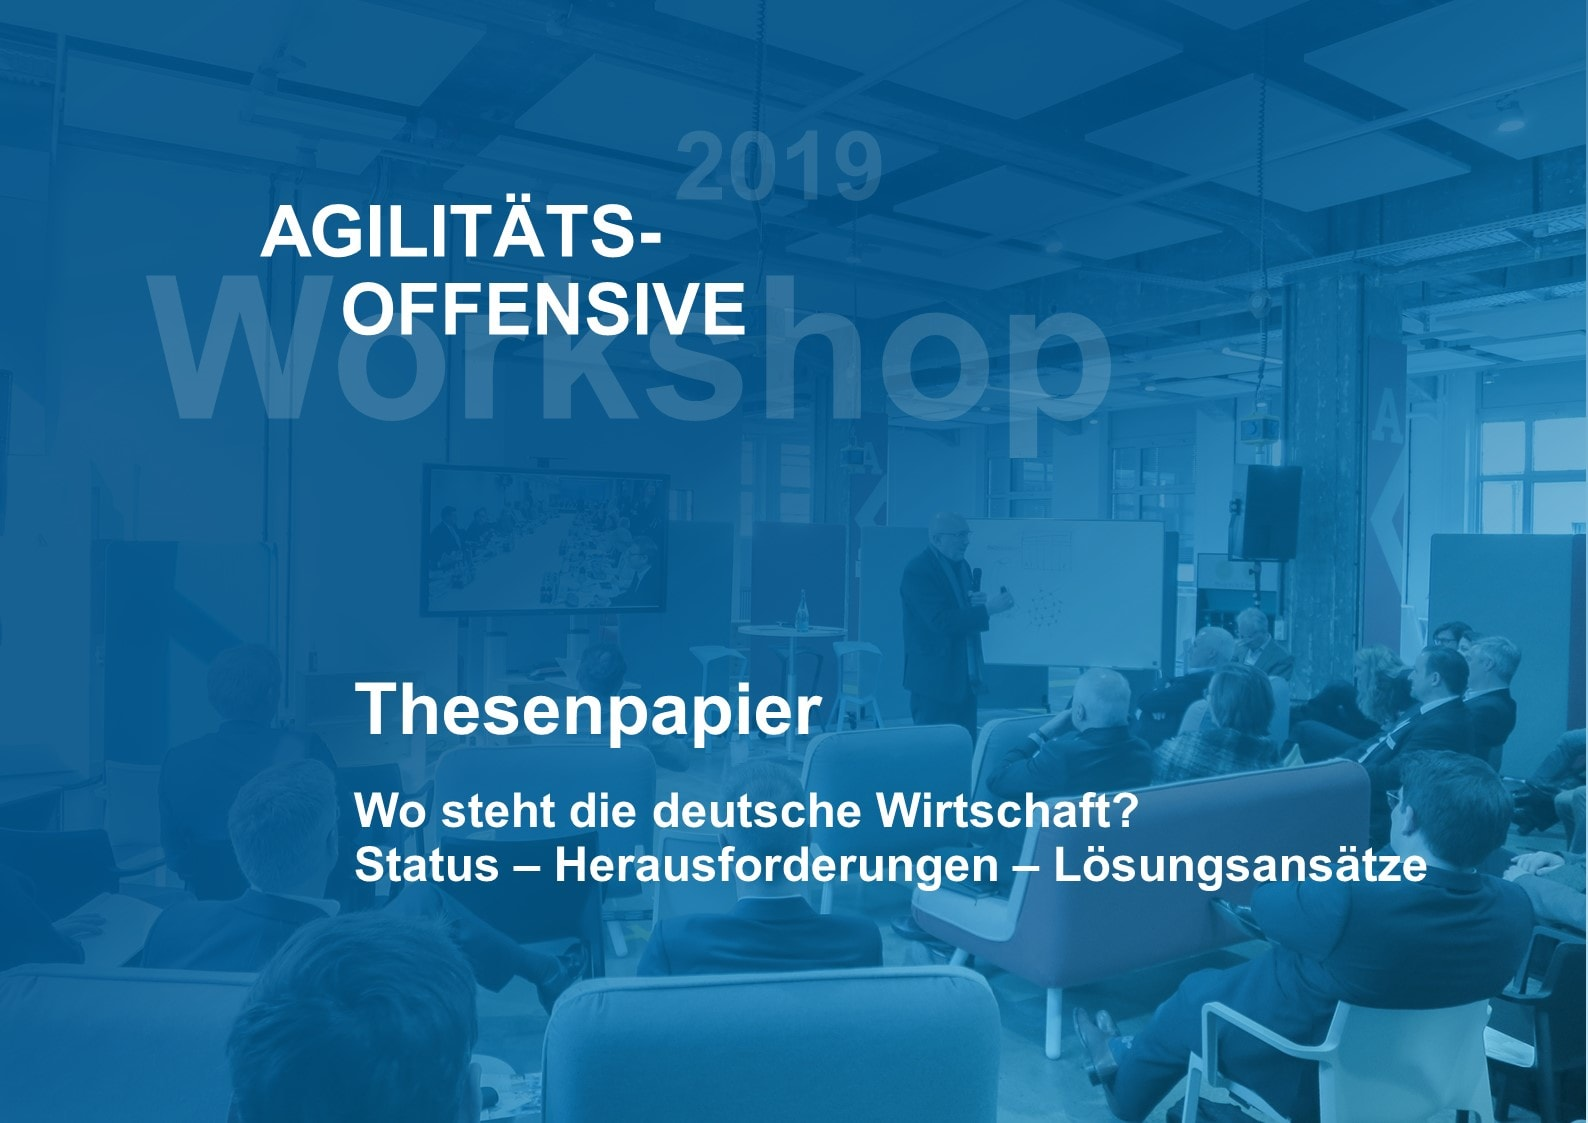 Thesenpapier Agilitätsoffensive 2019